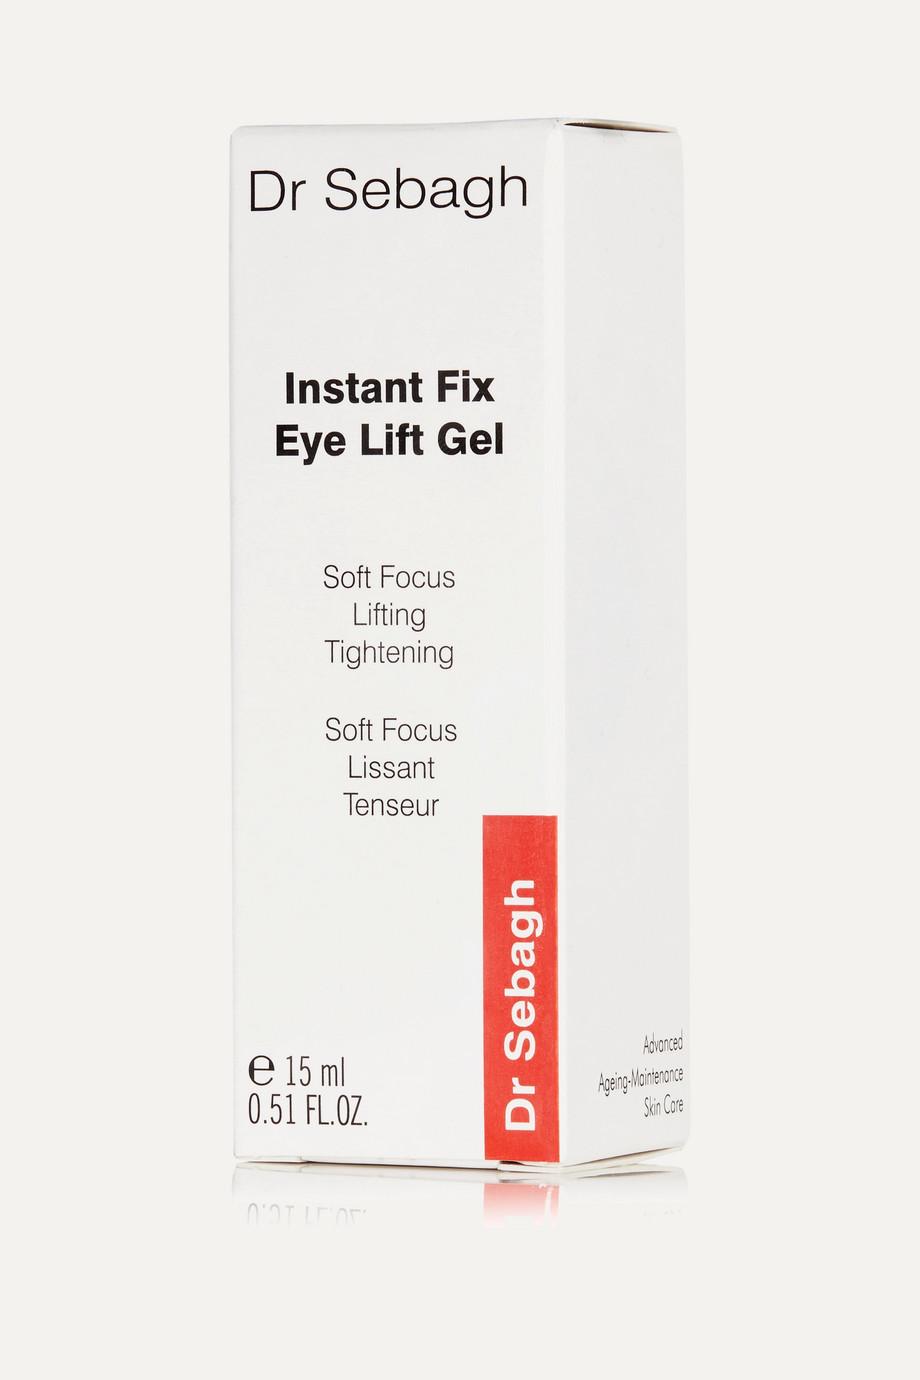 Dr Sebagh Instant Fix Eye Lift Gel, 15ml